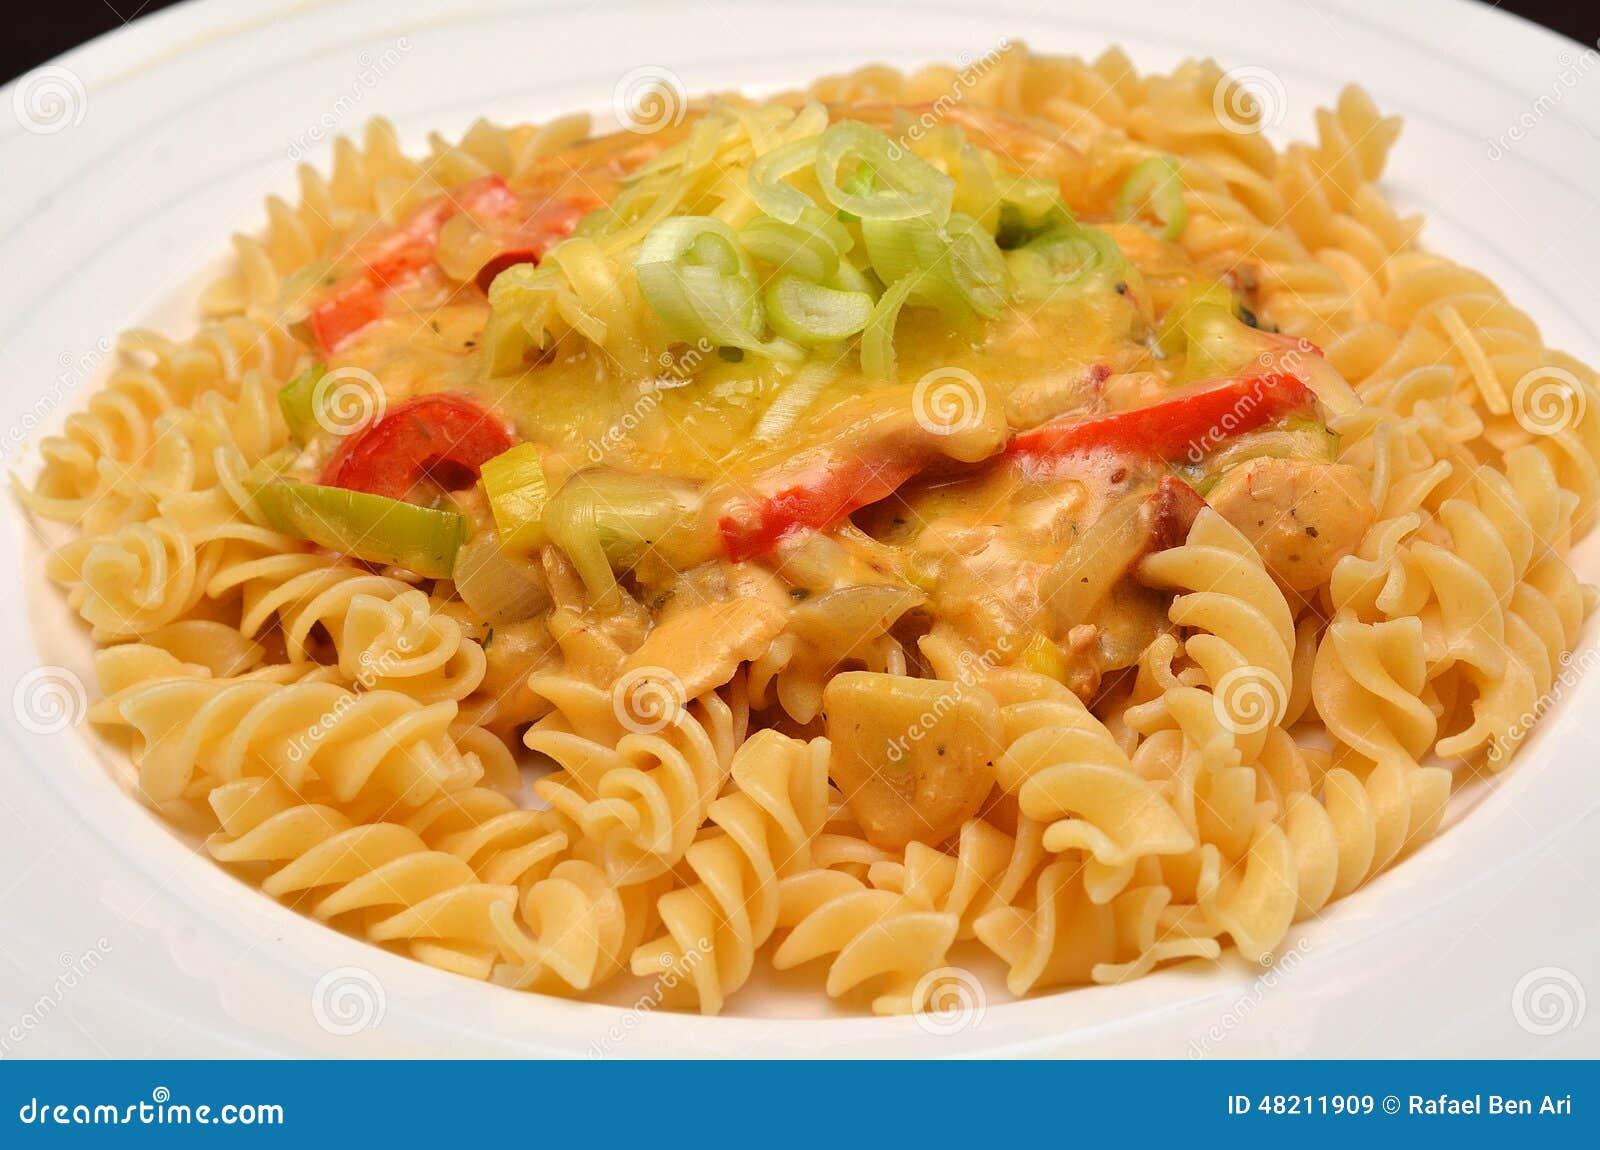 Italian Pasta With Sauce And Tuna Stock Photo - Image ...